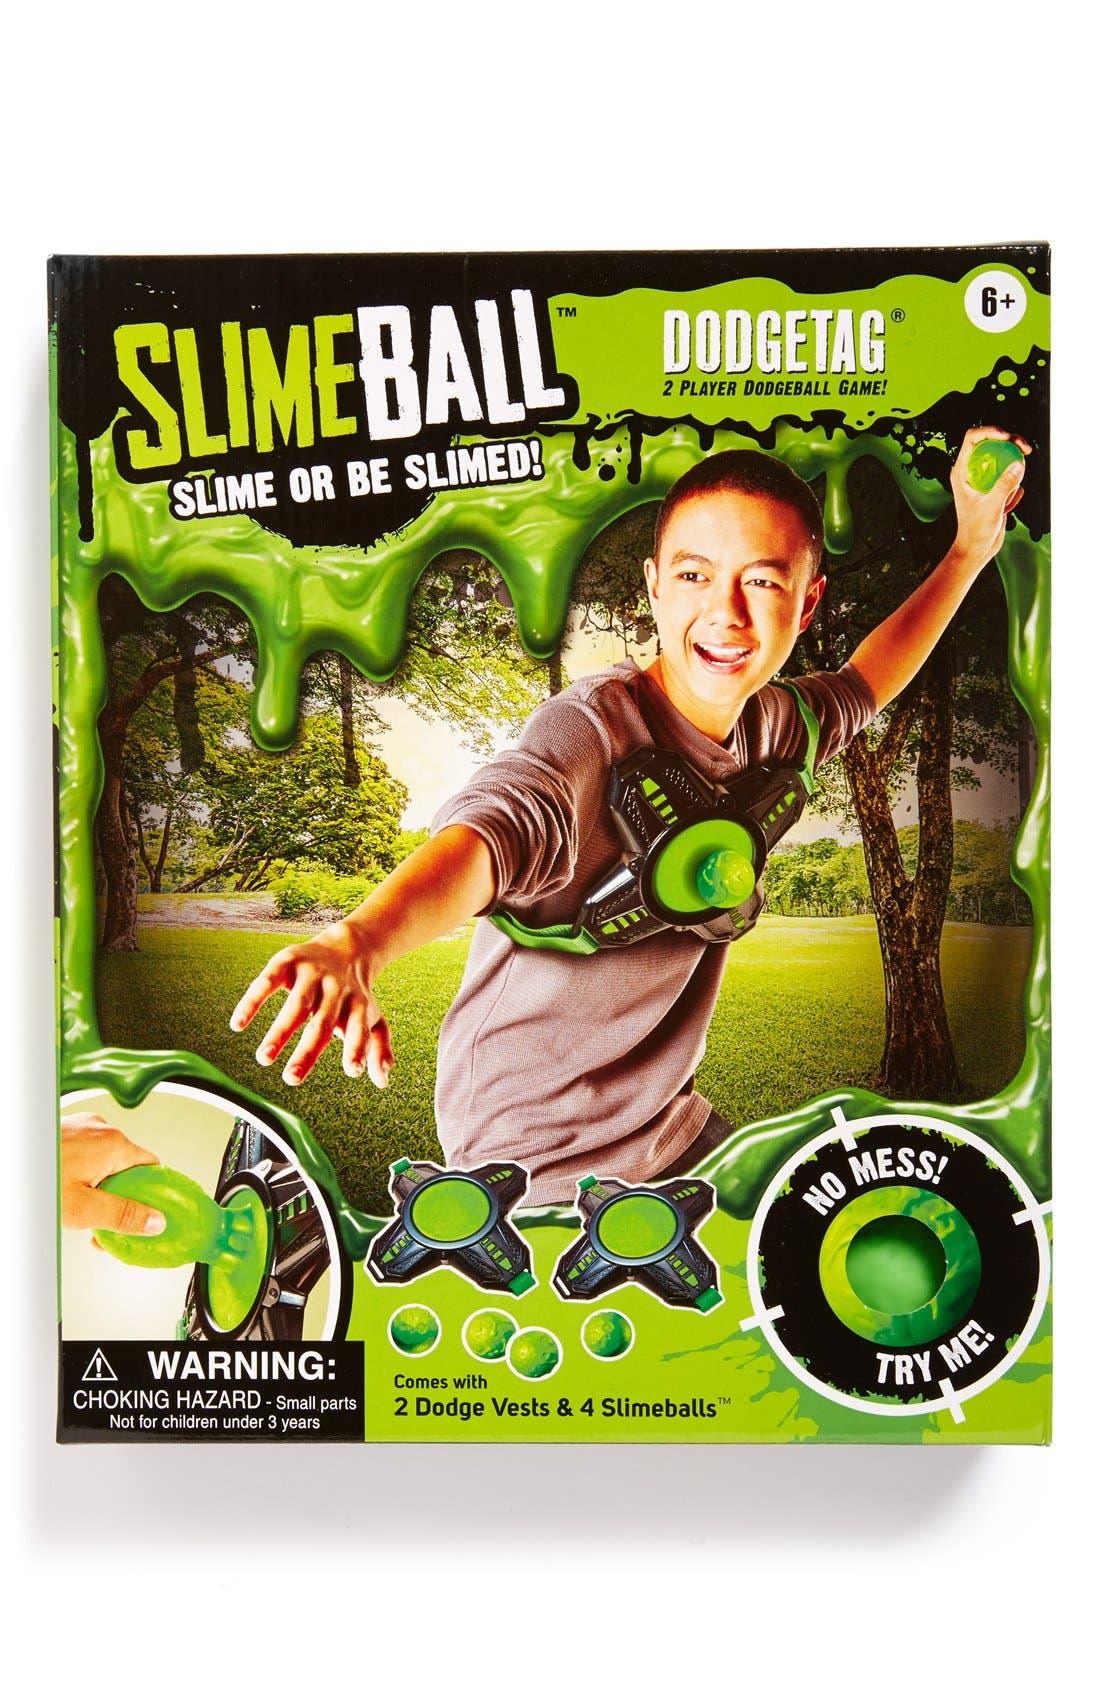 Main Image - Diggin'Slimeball' Dodgetag®